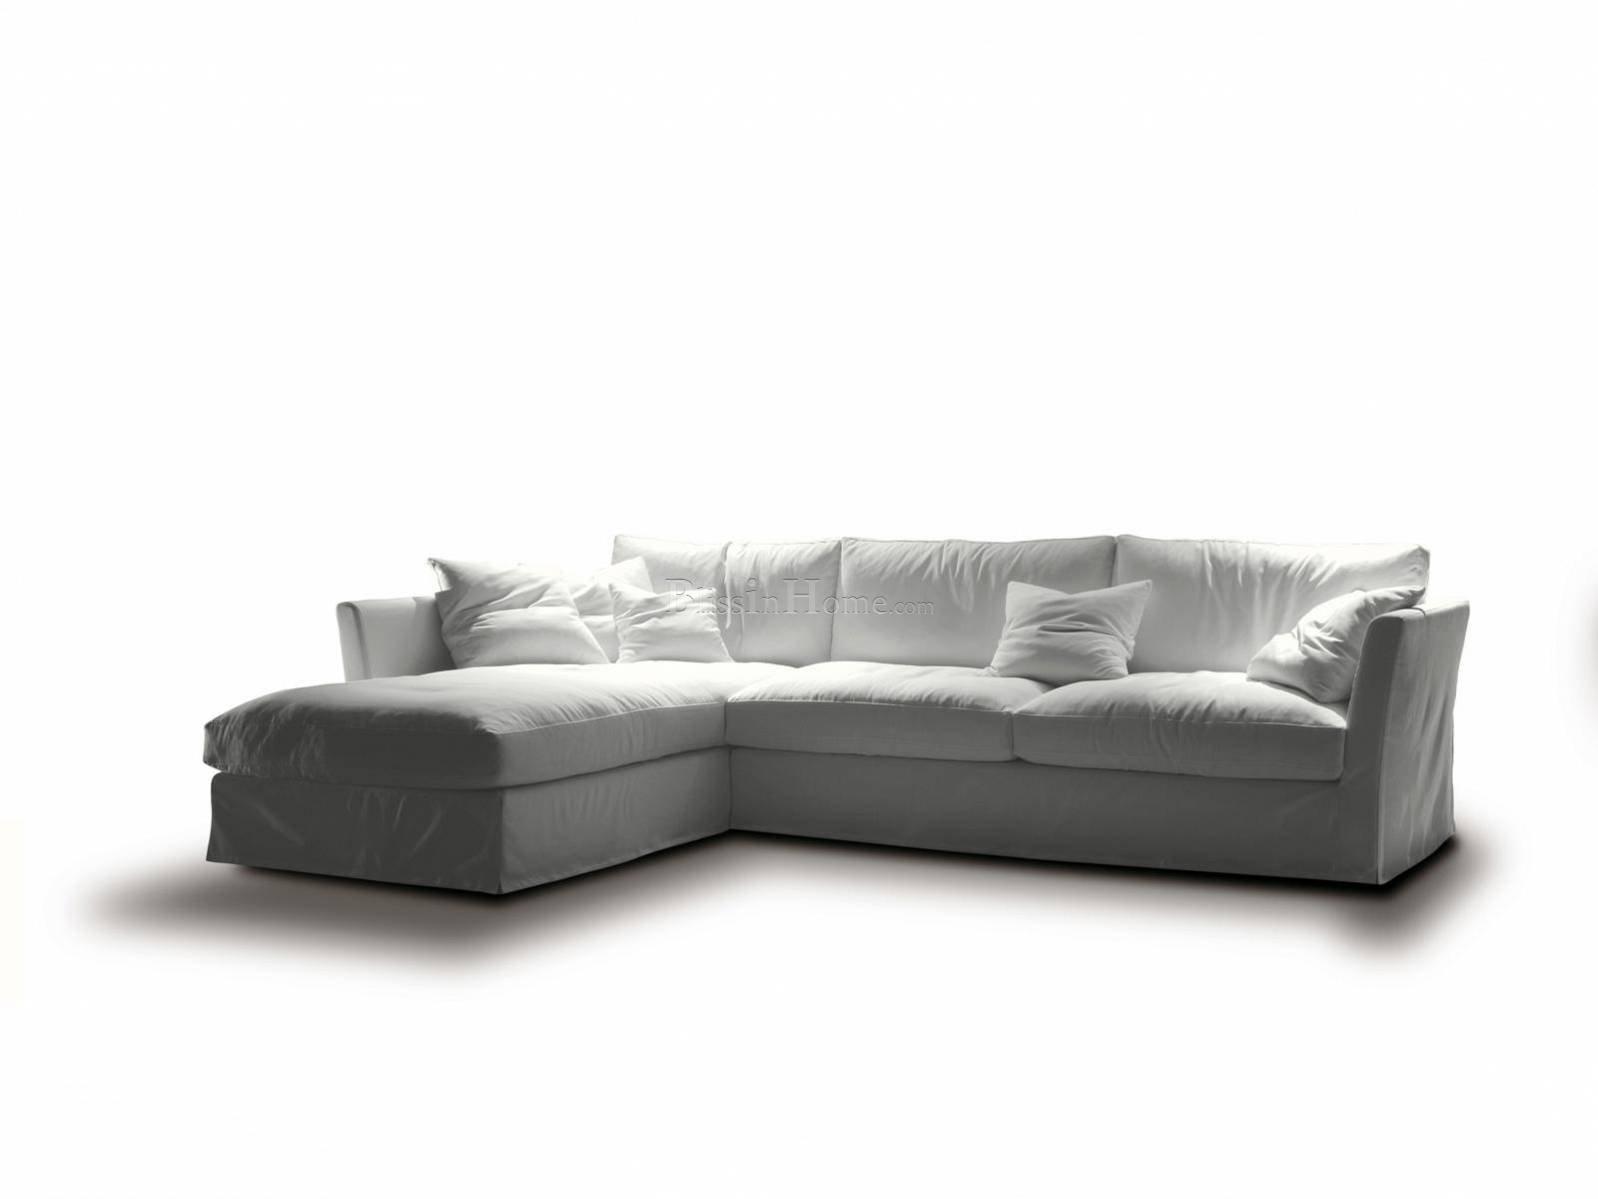 Poltrone Sofa concernant Poltronesofa Frigento